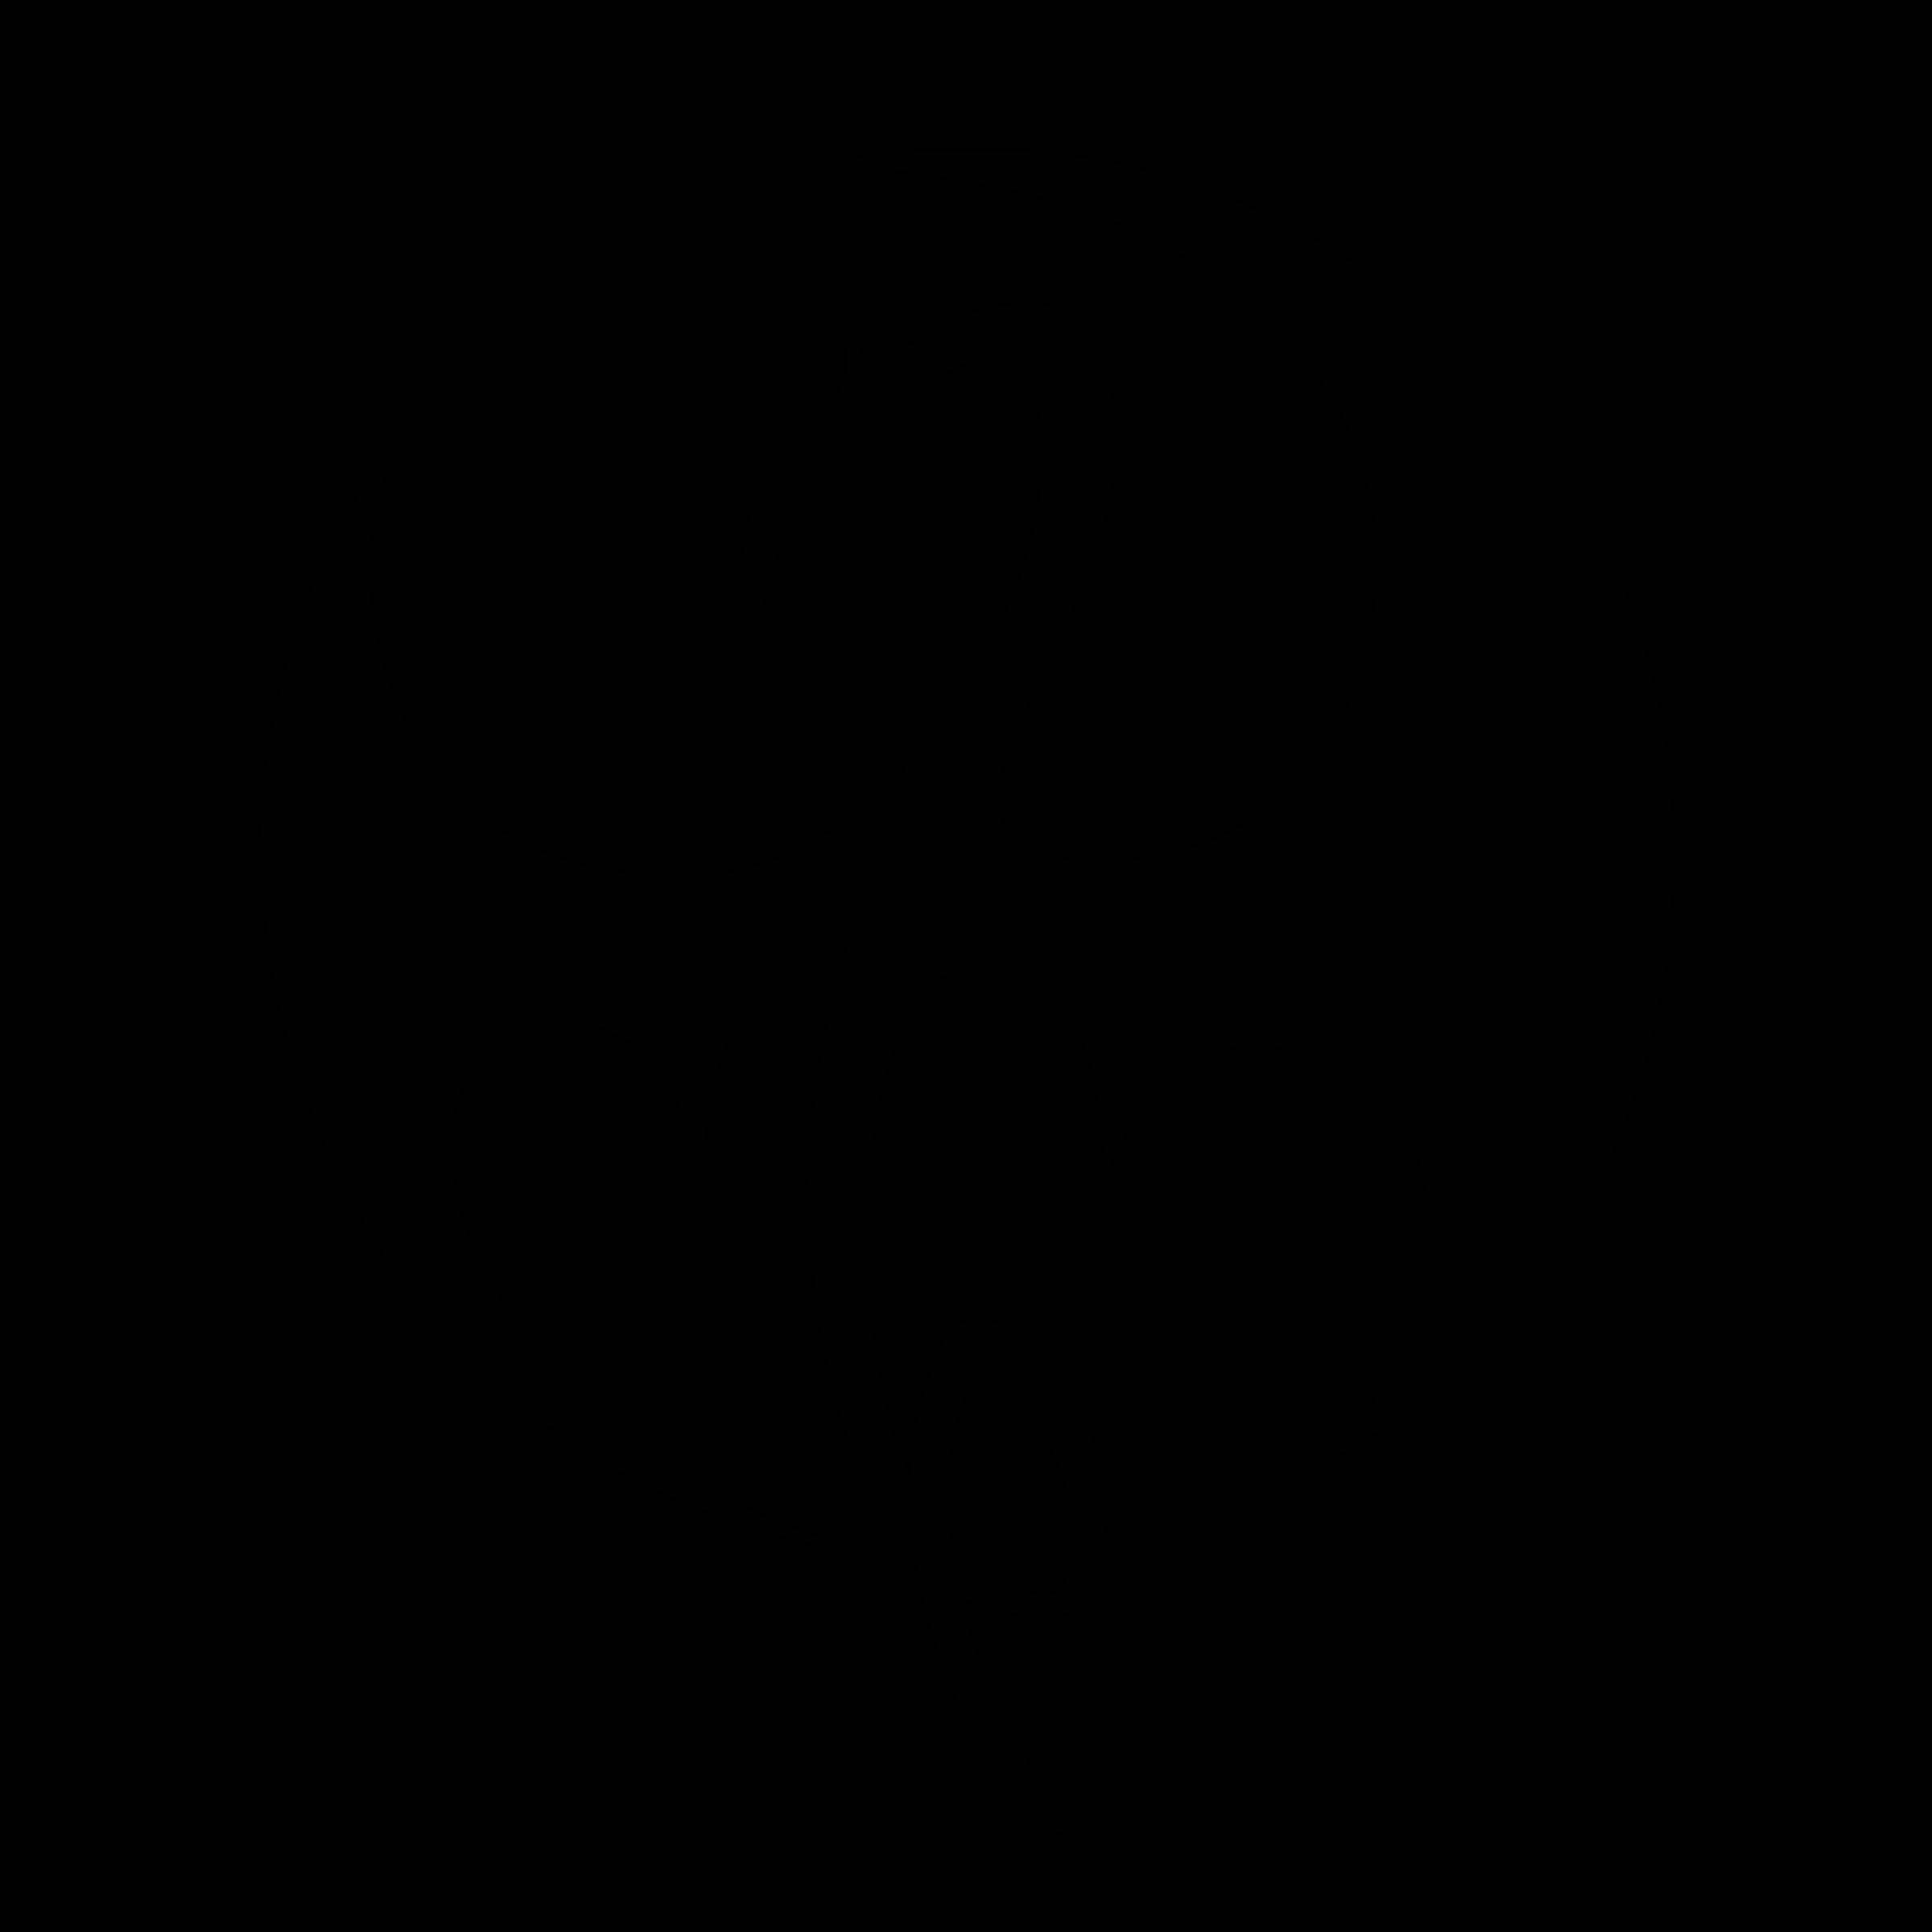 Iron Fist Marvel Cinematic Universe Captain America Logo.